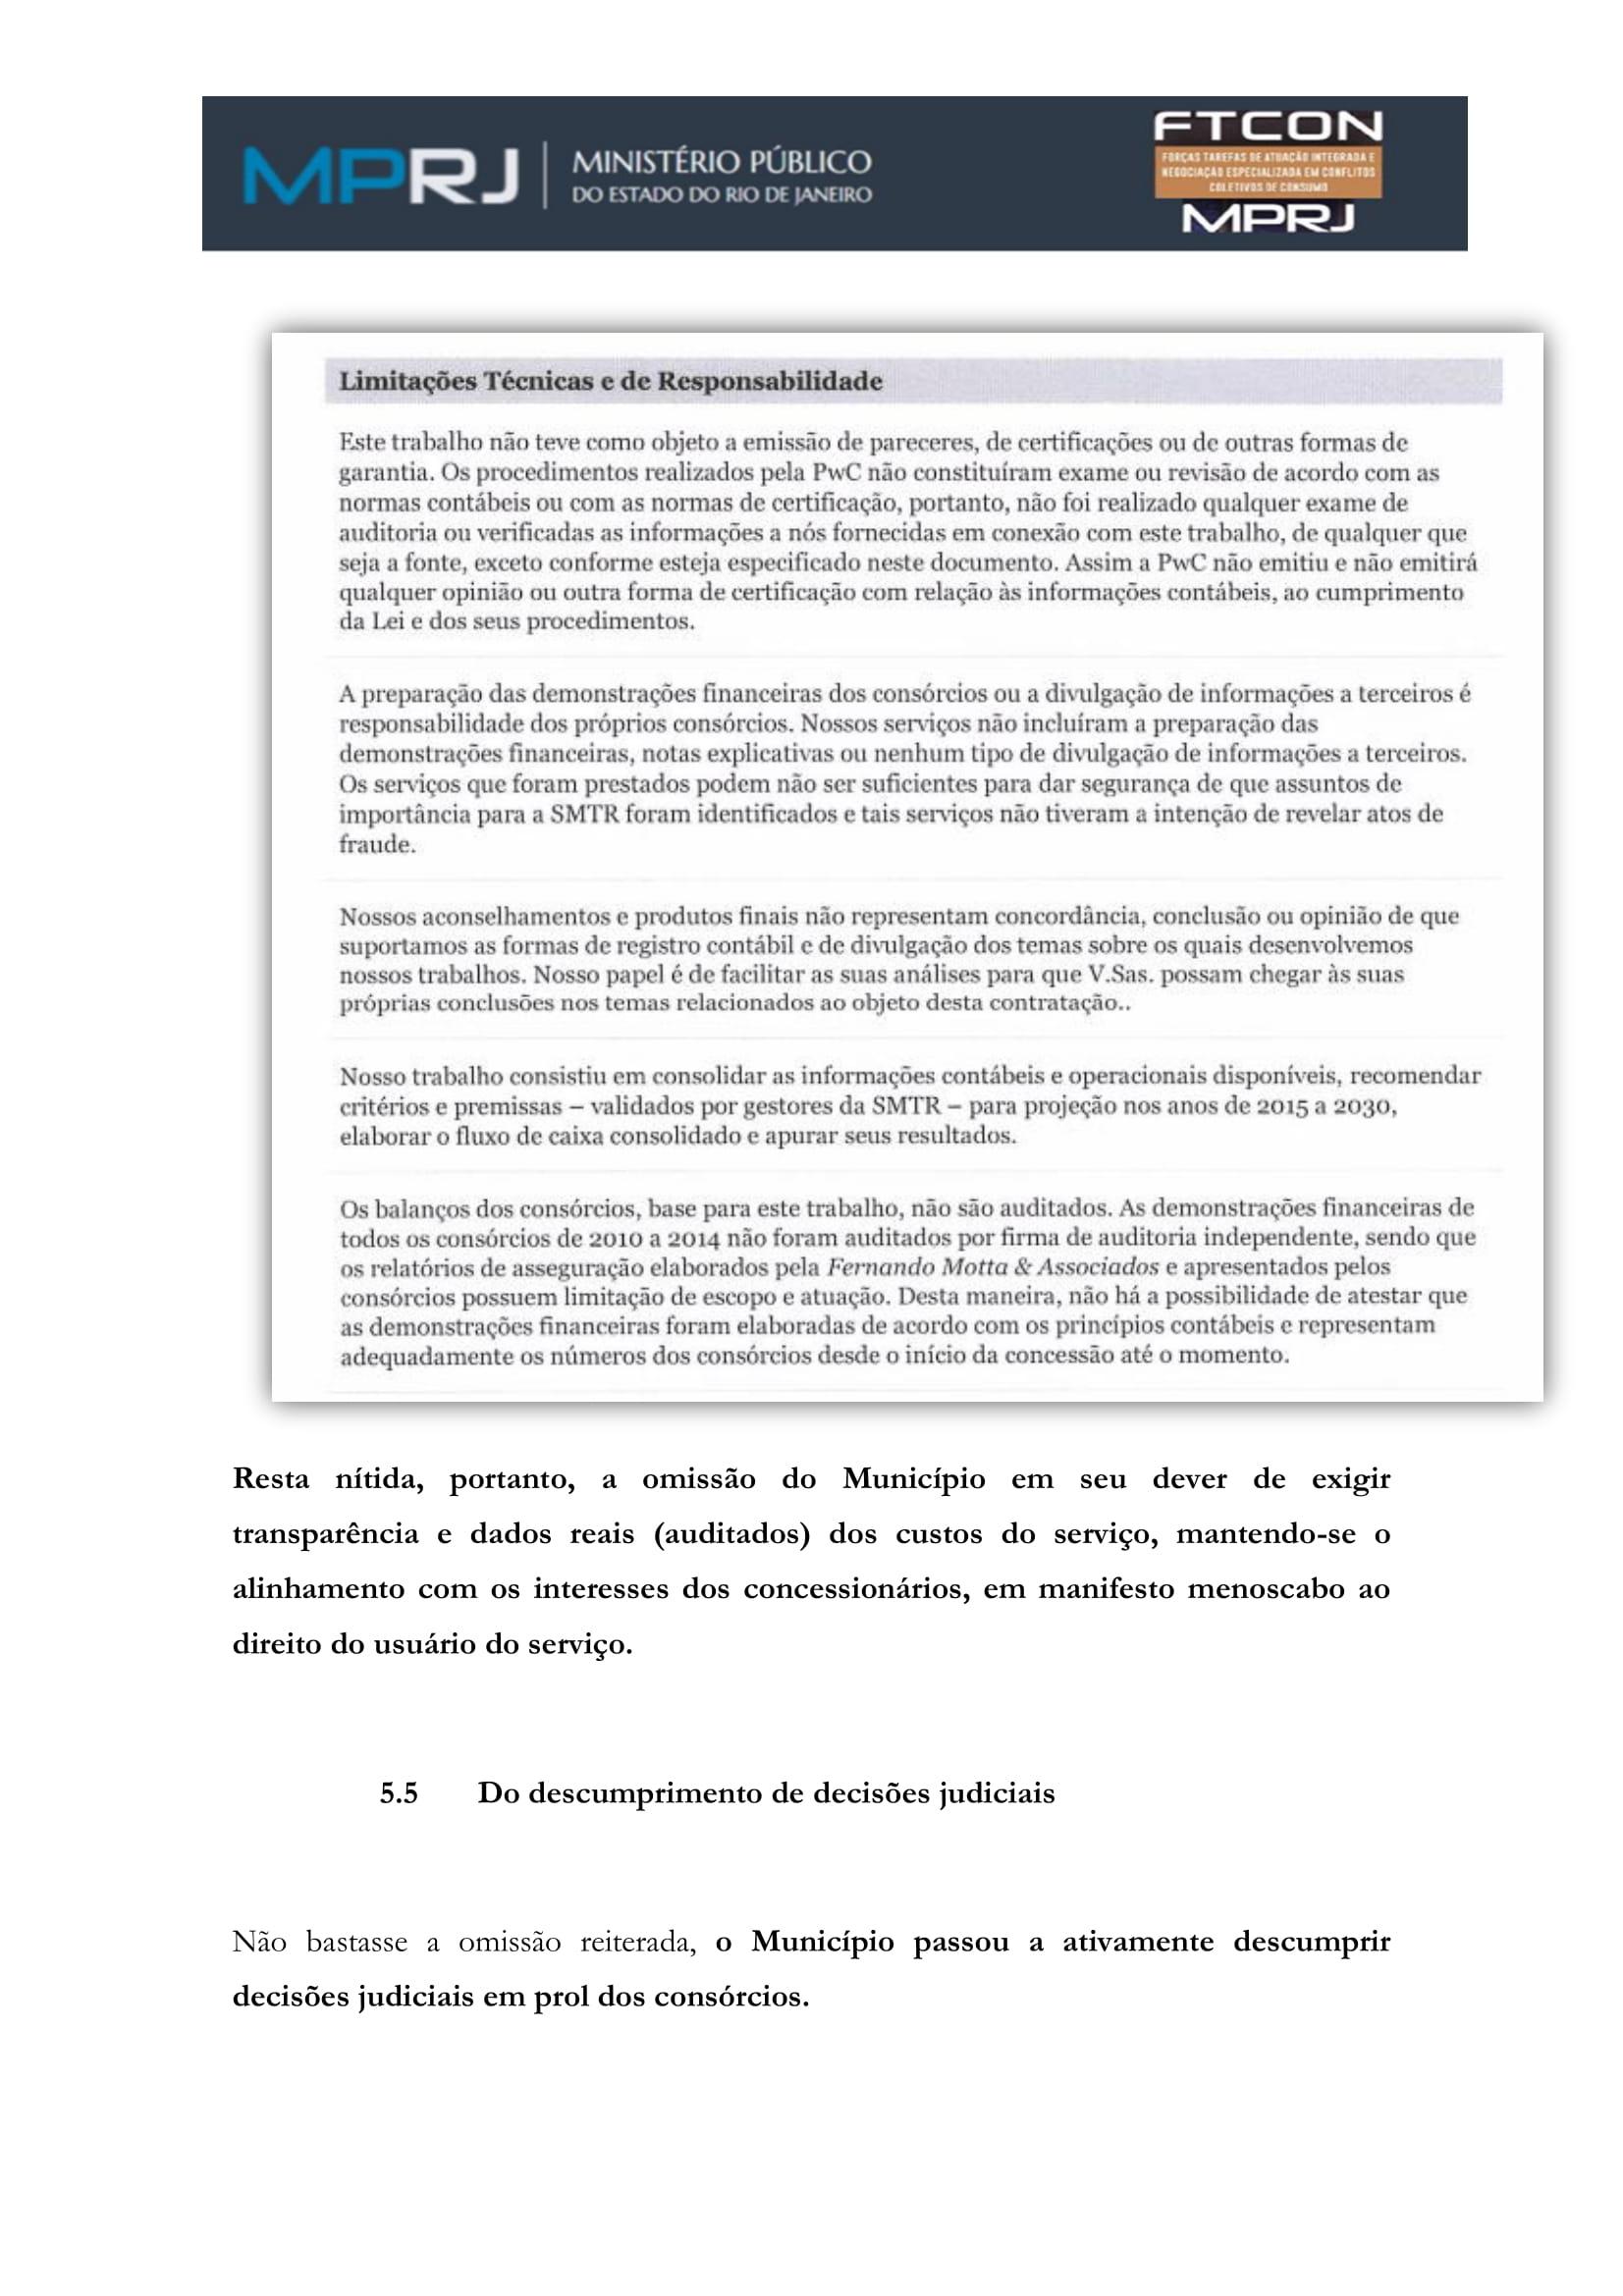 acp_caducidade_onibus_dr_rt-118